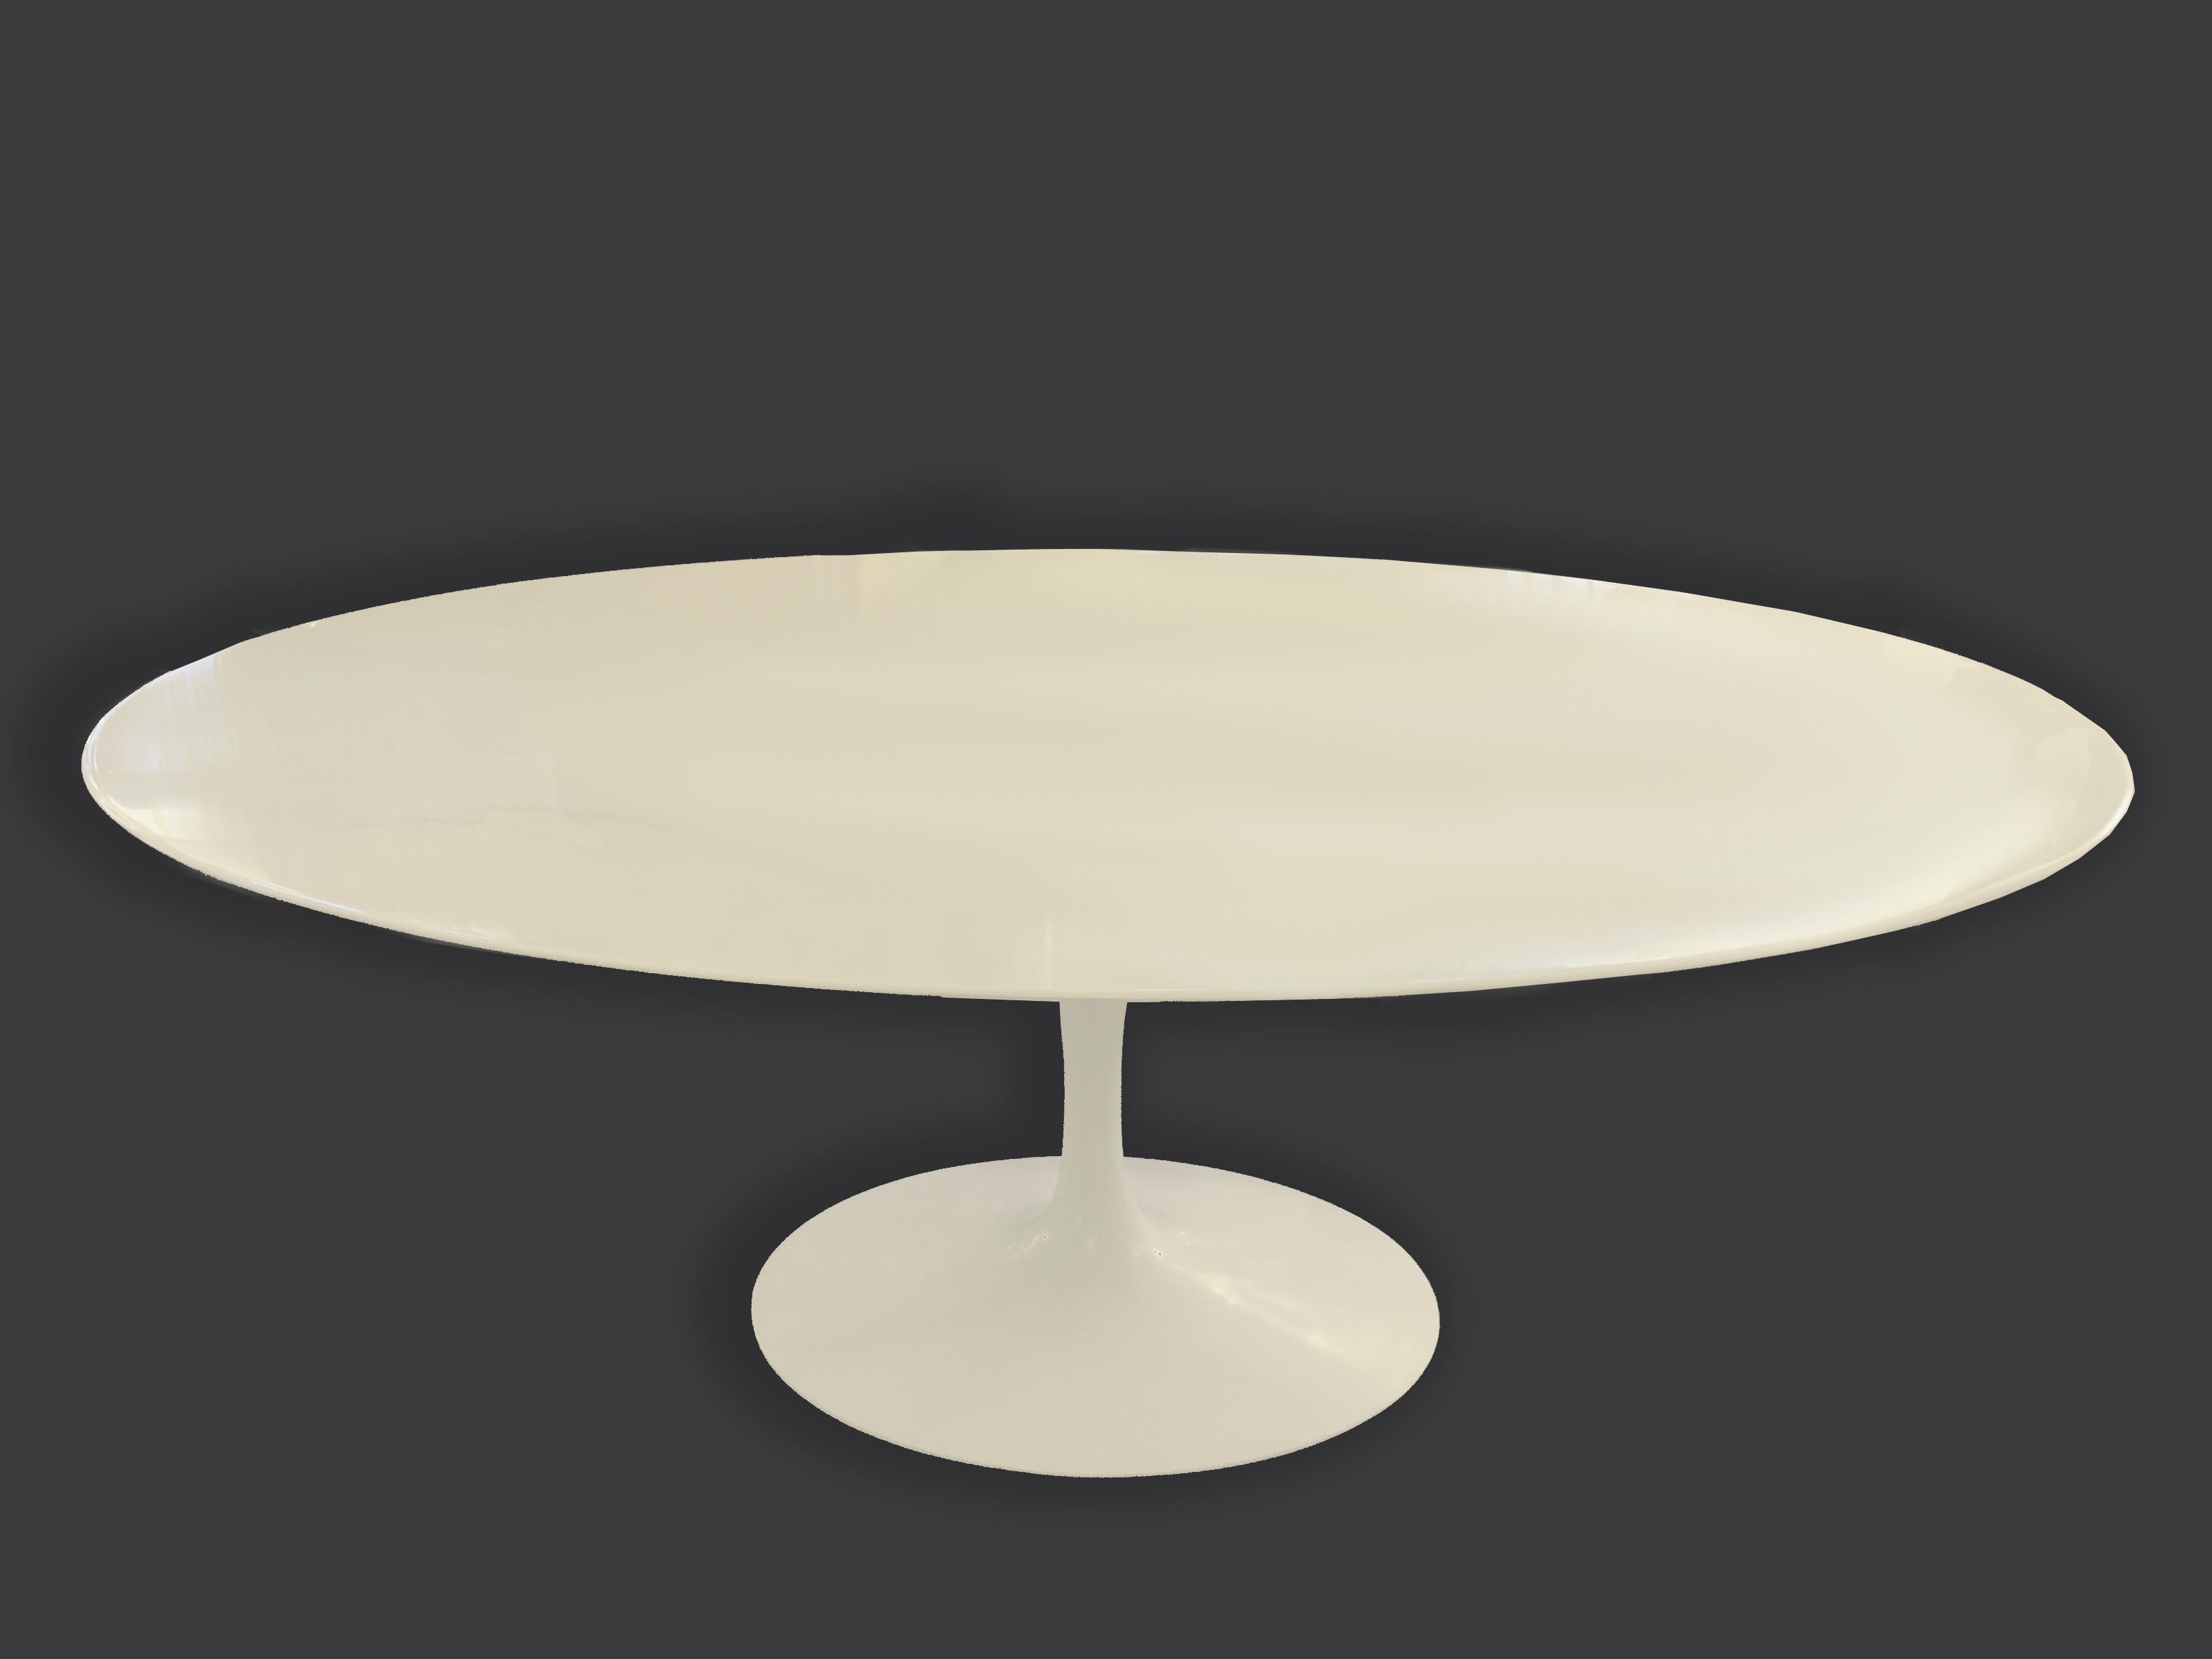 Table Knoll Ovale Marbre Blanc Top Saarinen Table Basse Oval De